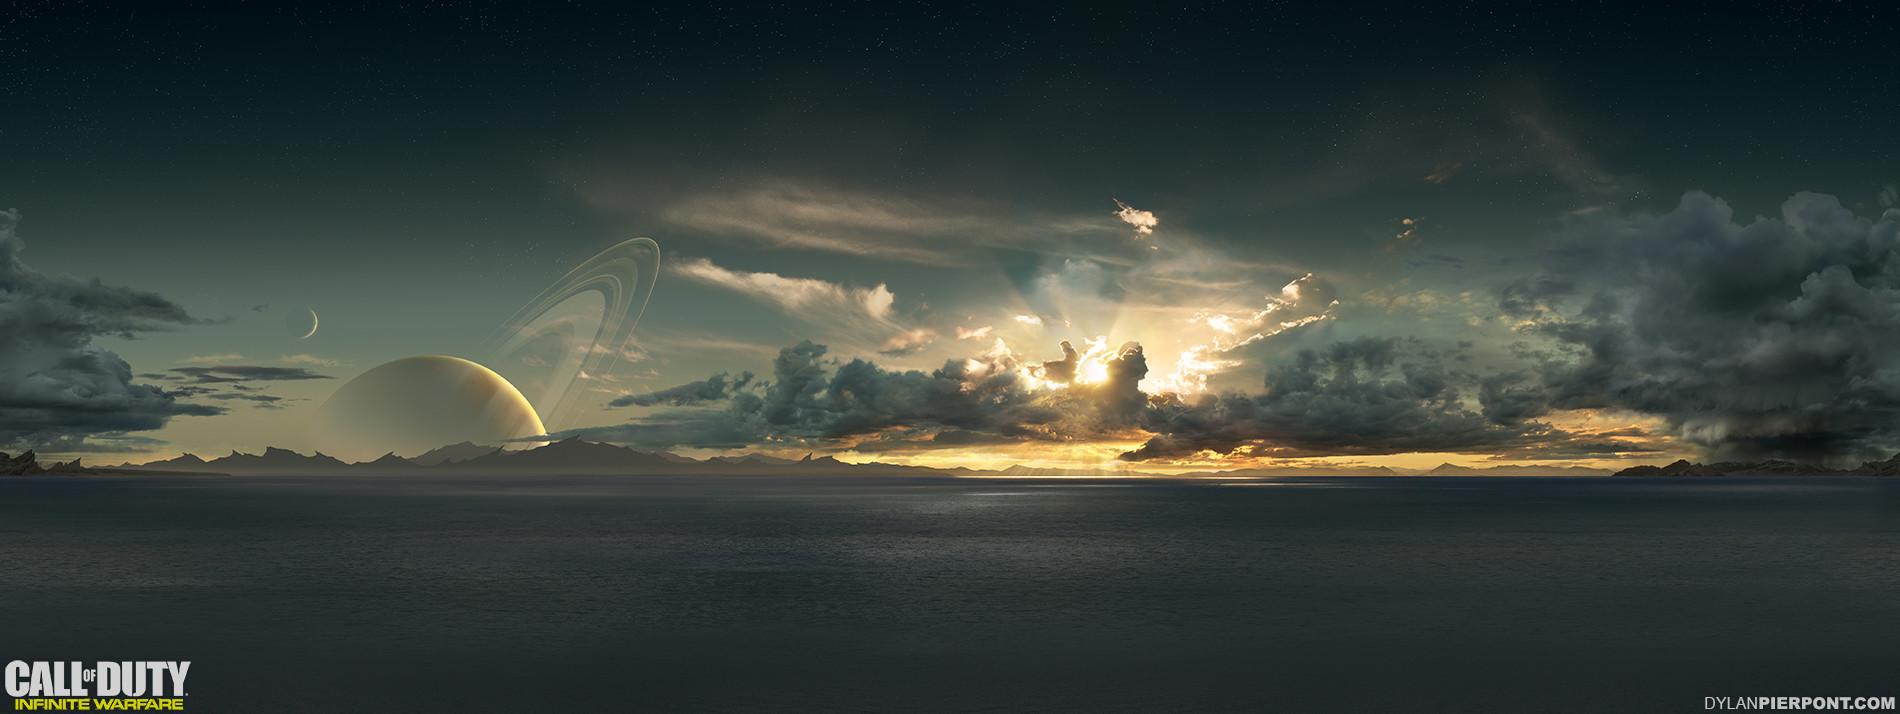 Dylan pierpont dylan pierpont infinite warfare skydome 01